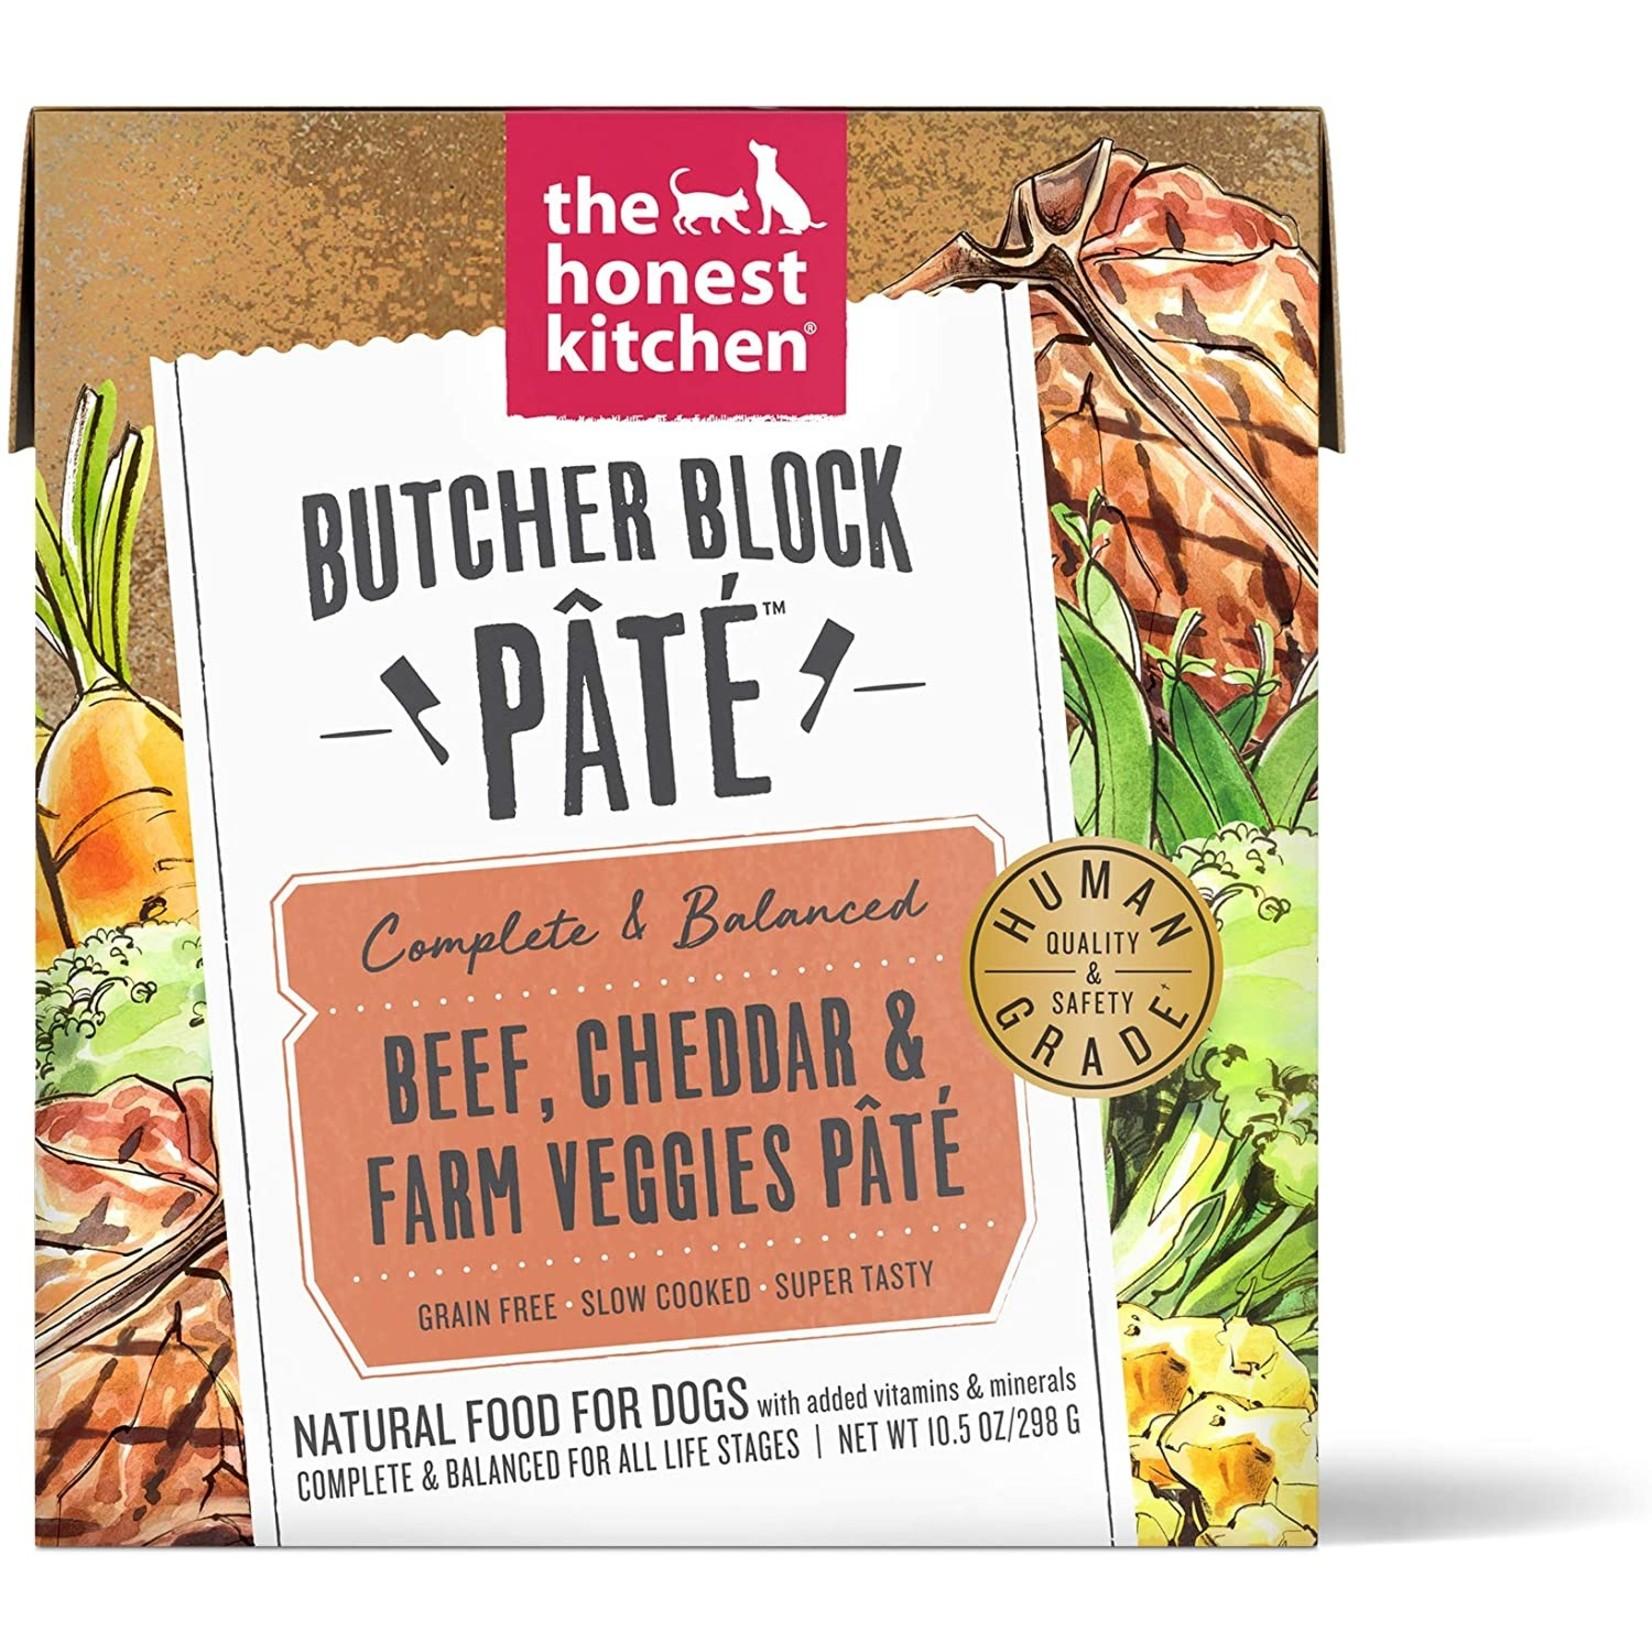 Honest Kitchen THK Butcher Block Pate Beef Cheddar Veggies Dog Can 10.5oz